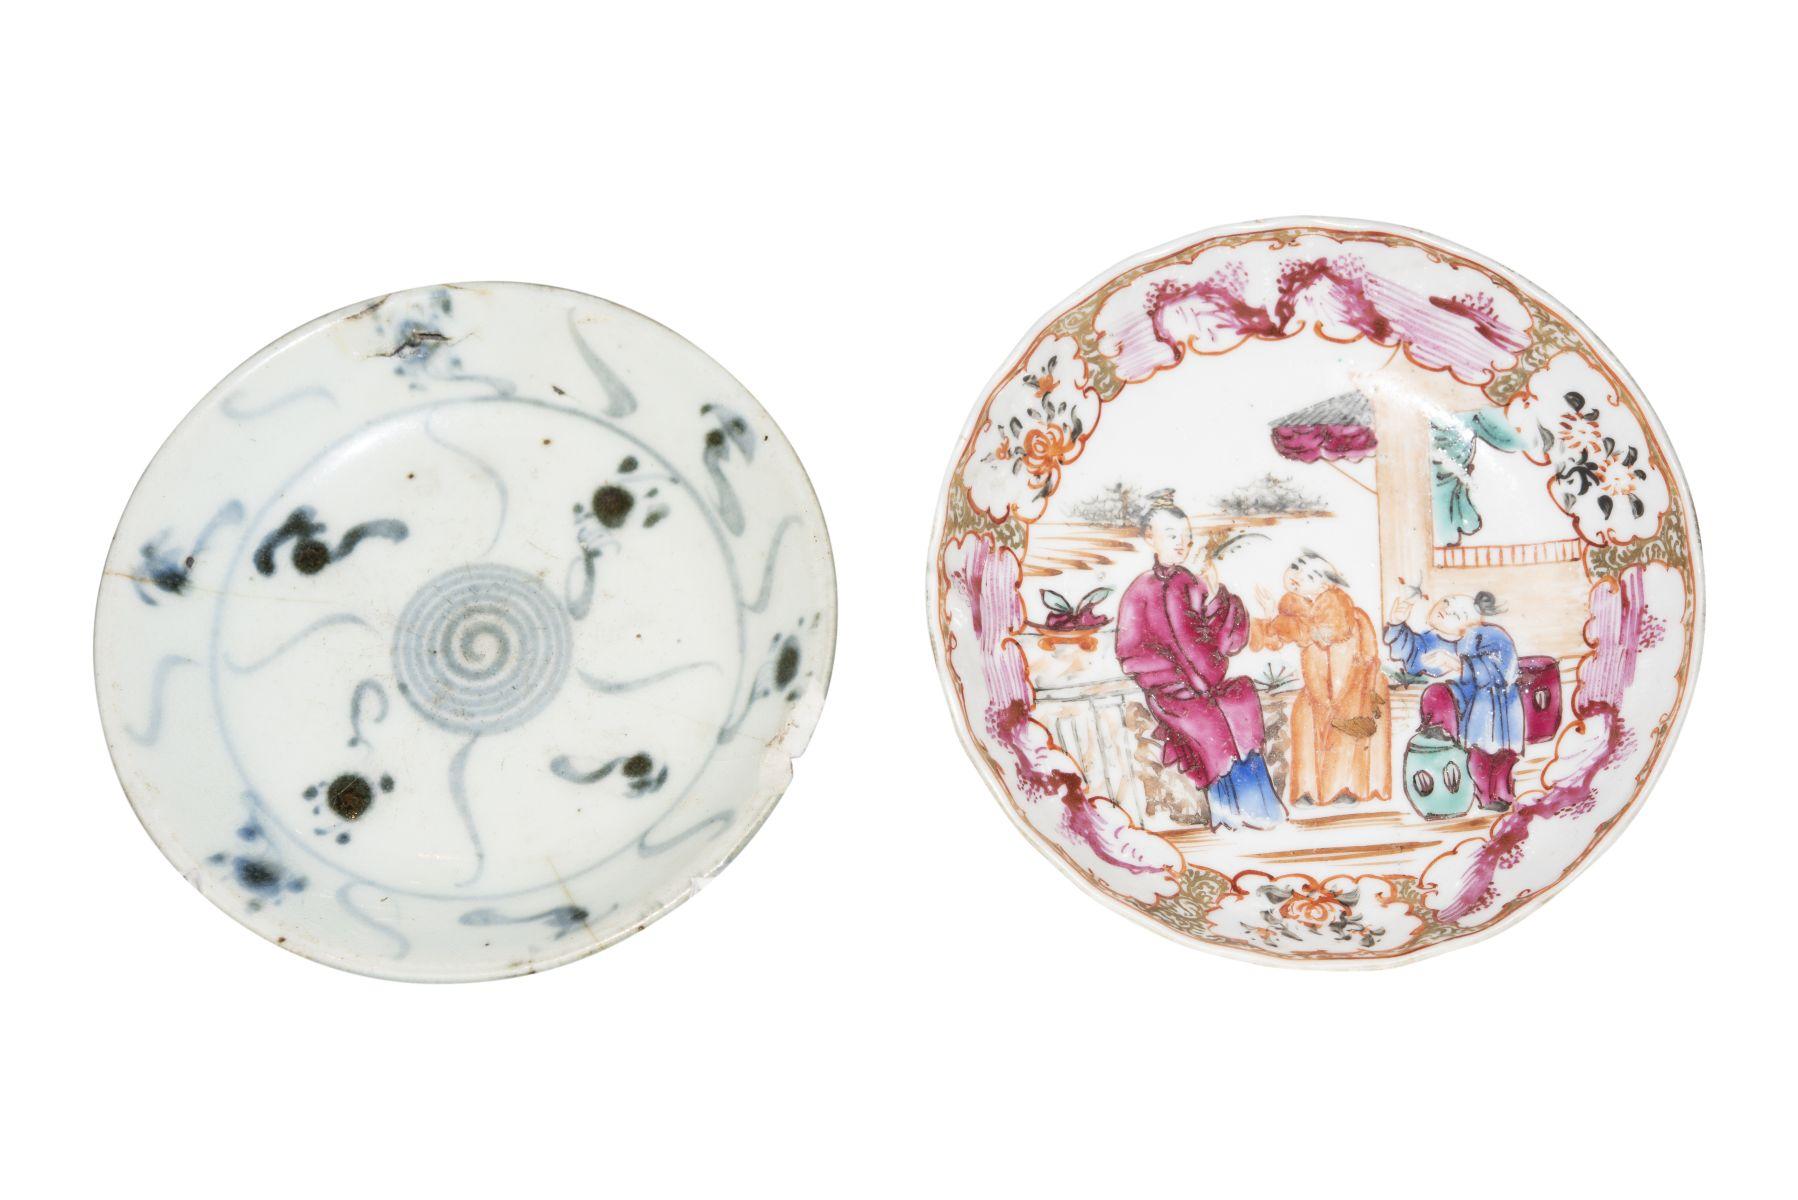 #205 2 small plates Qing Dynasty | 2 kleine Teller Qing Dynastie Image